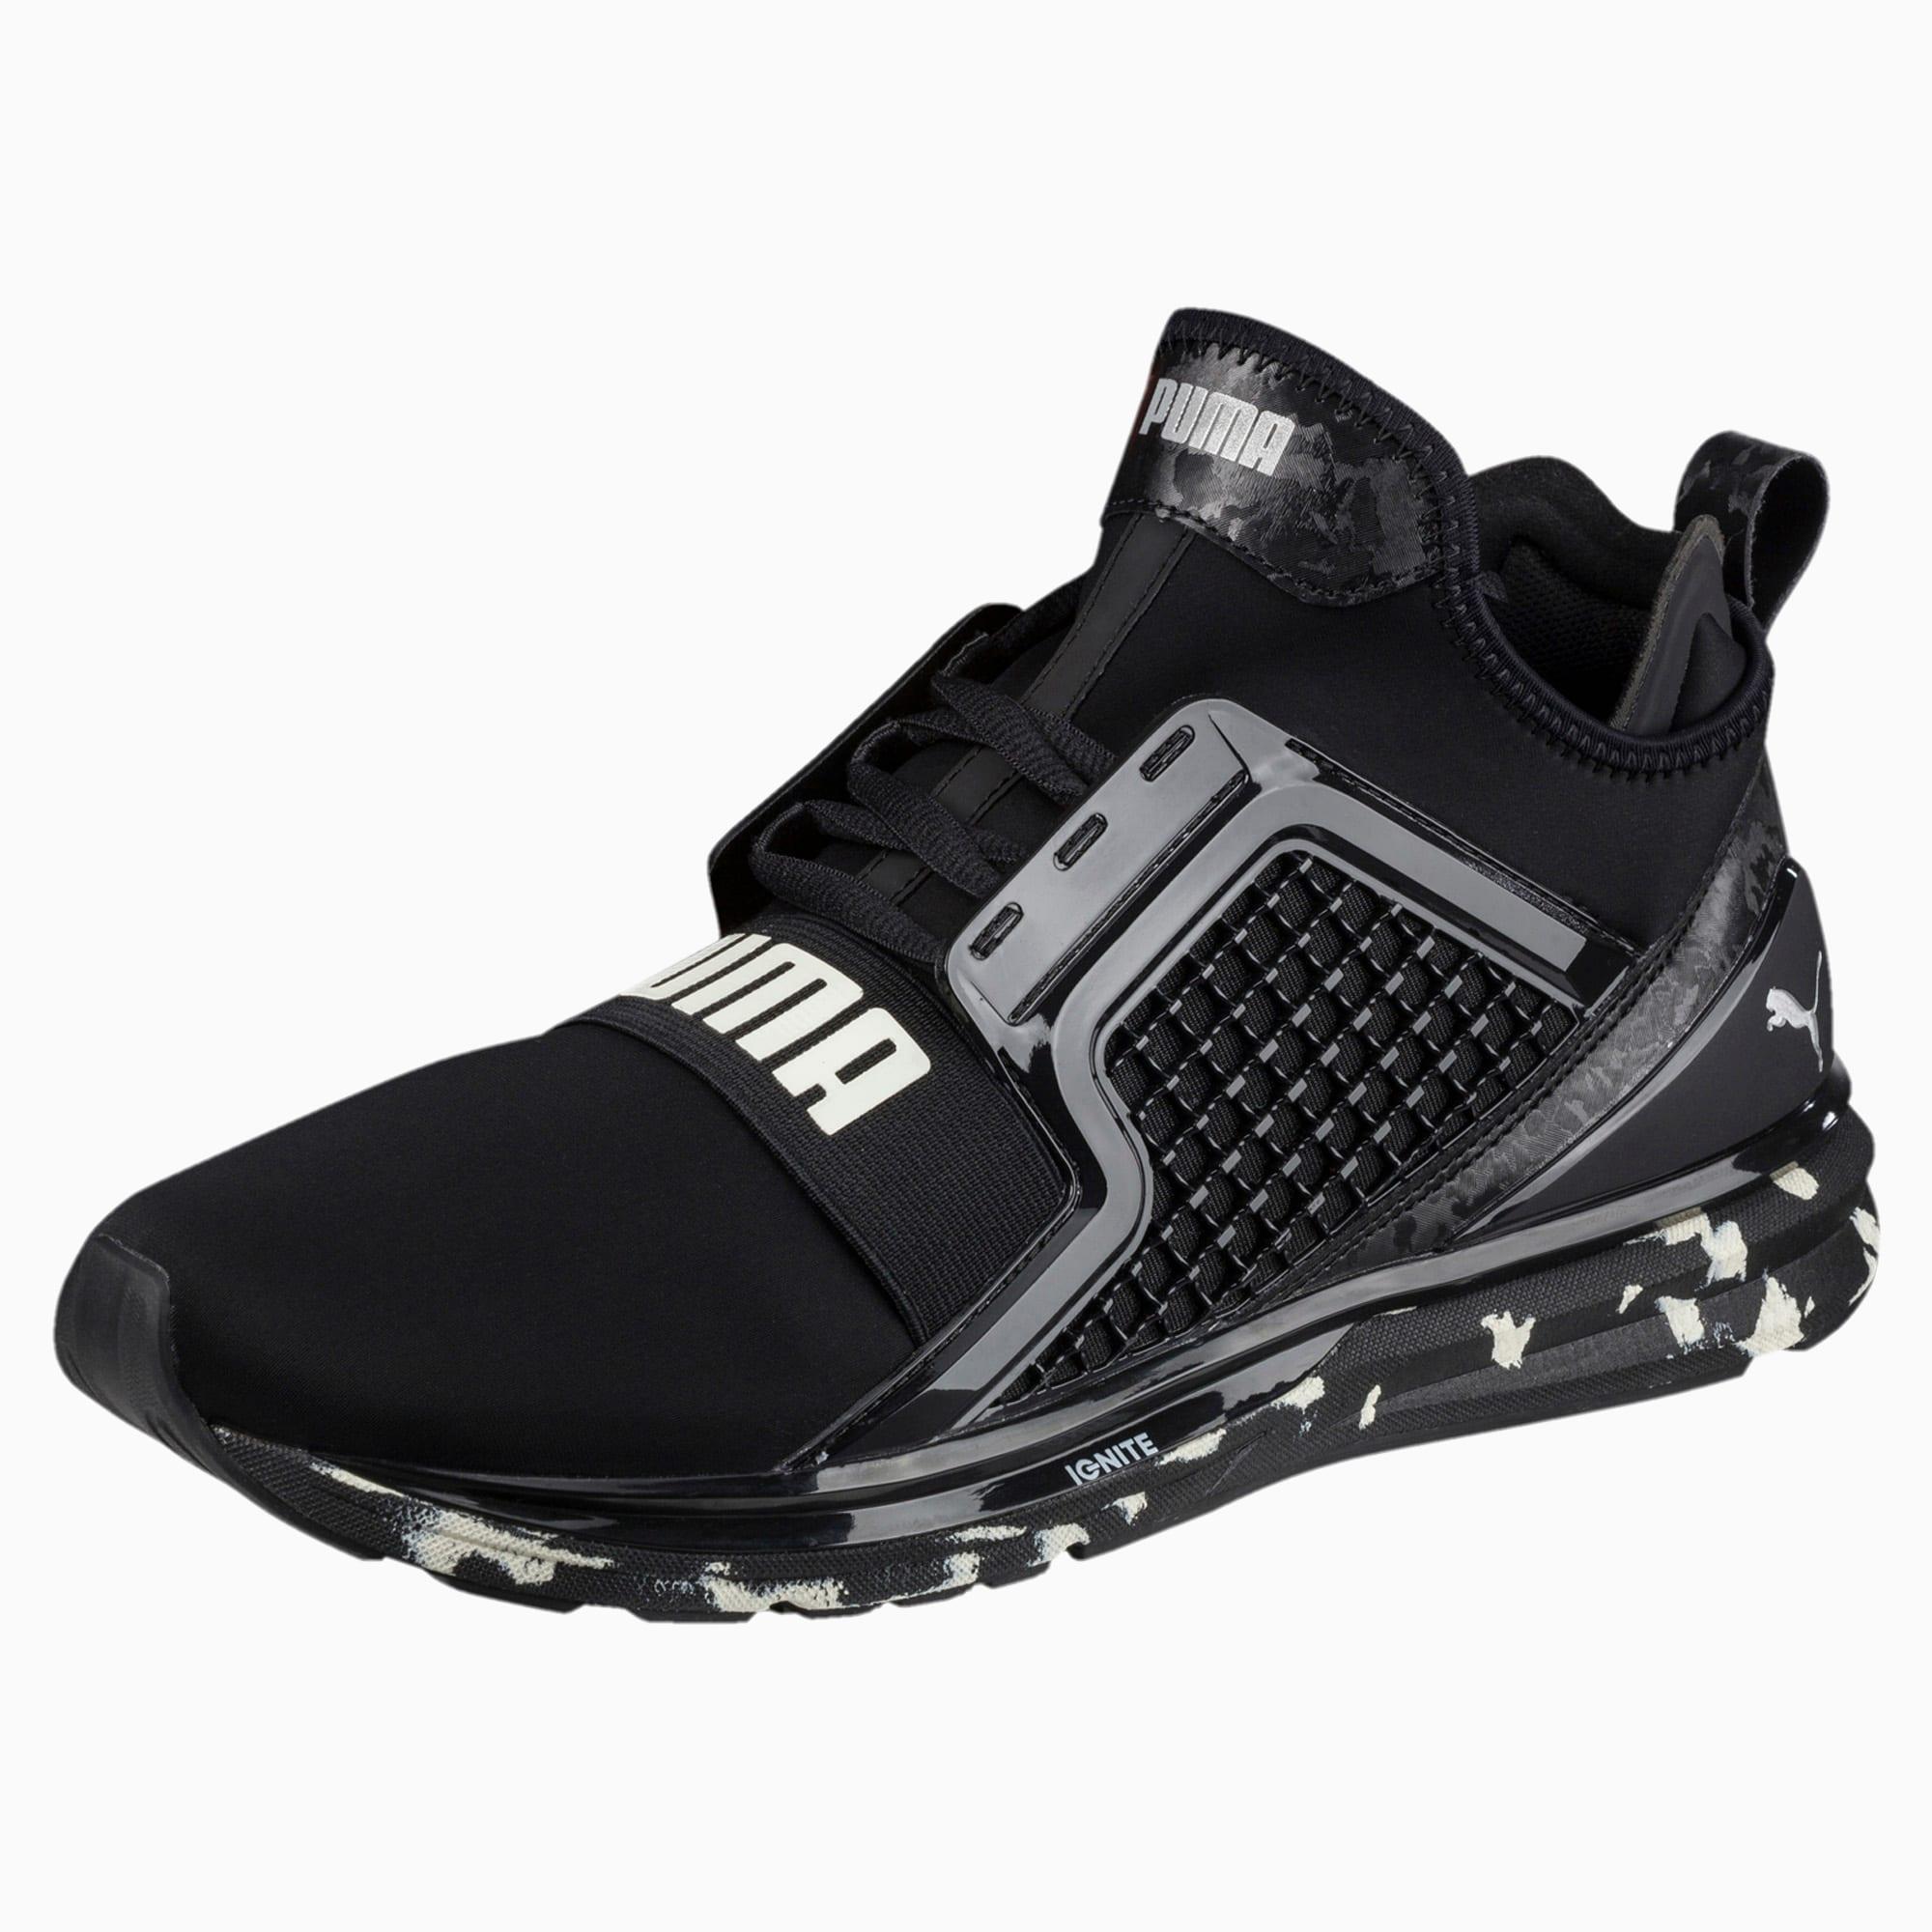 Puma Ignite Limitless Swirl Black Mens Athletic Running Shoes